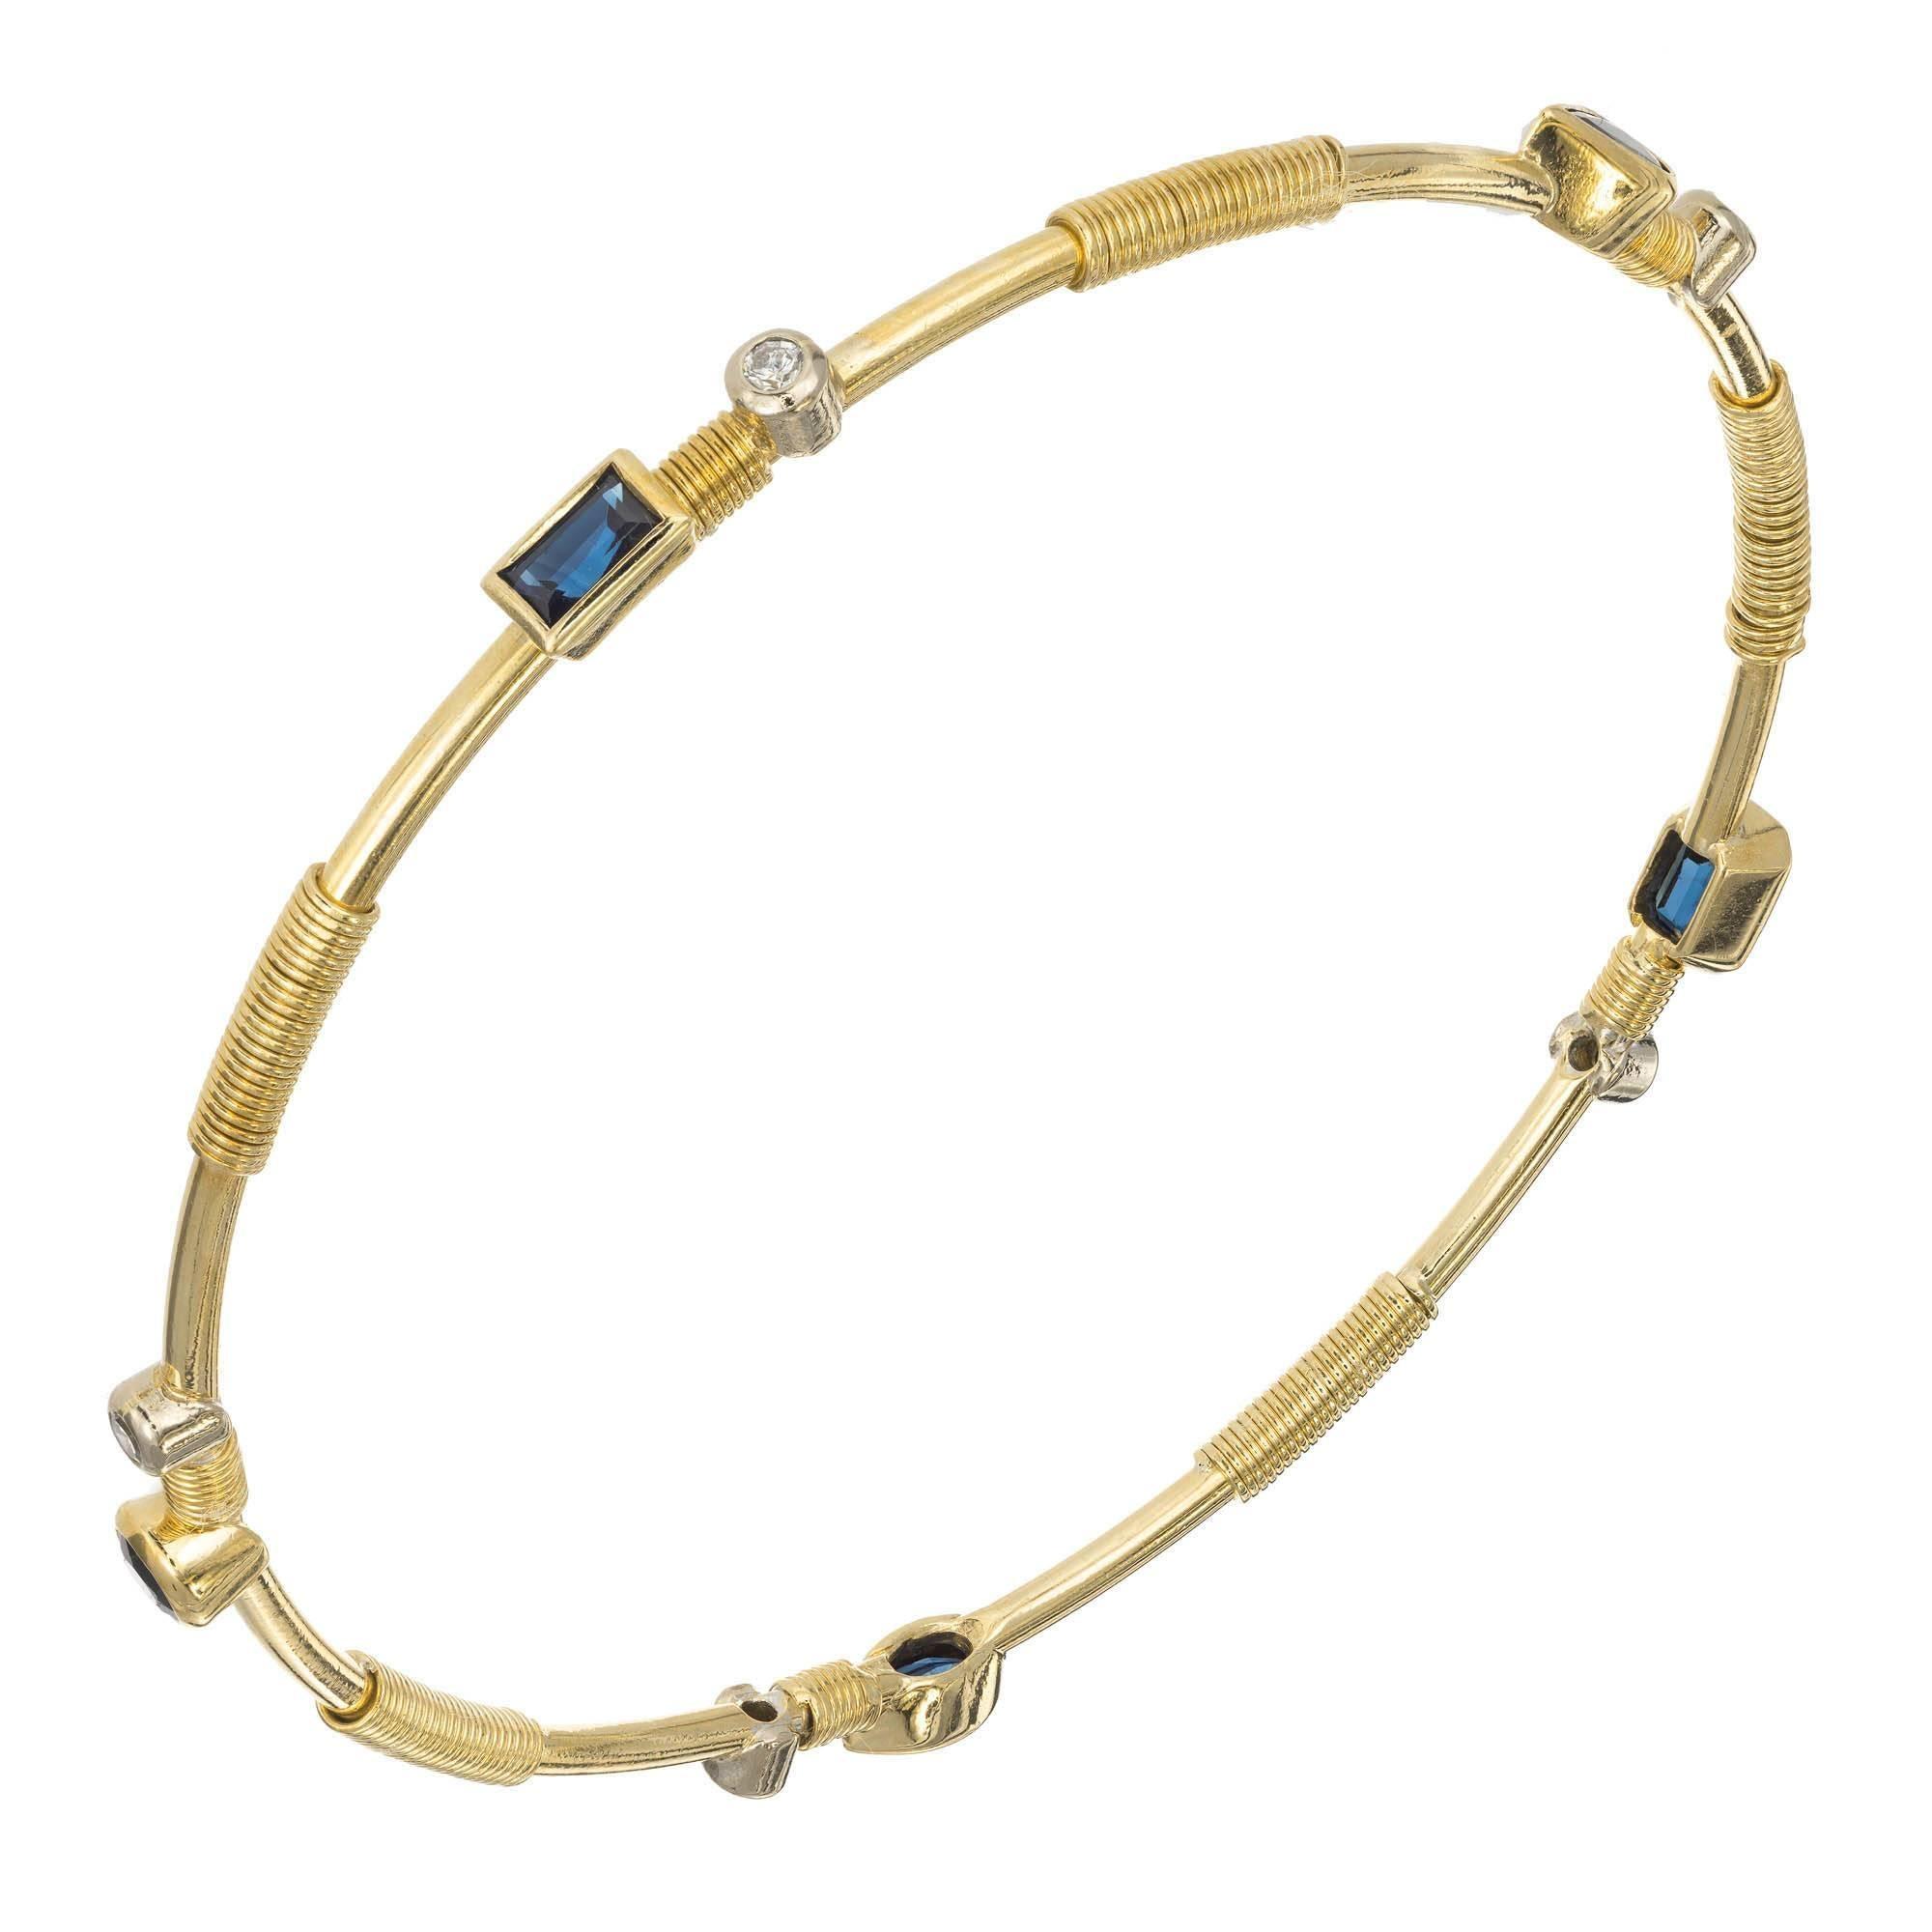 1.79 Carat Sapphire Diamond Yellow Gold Bangle Bracelet